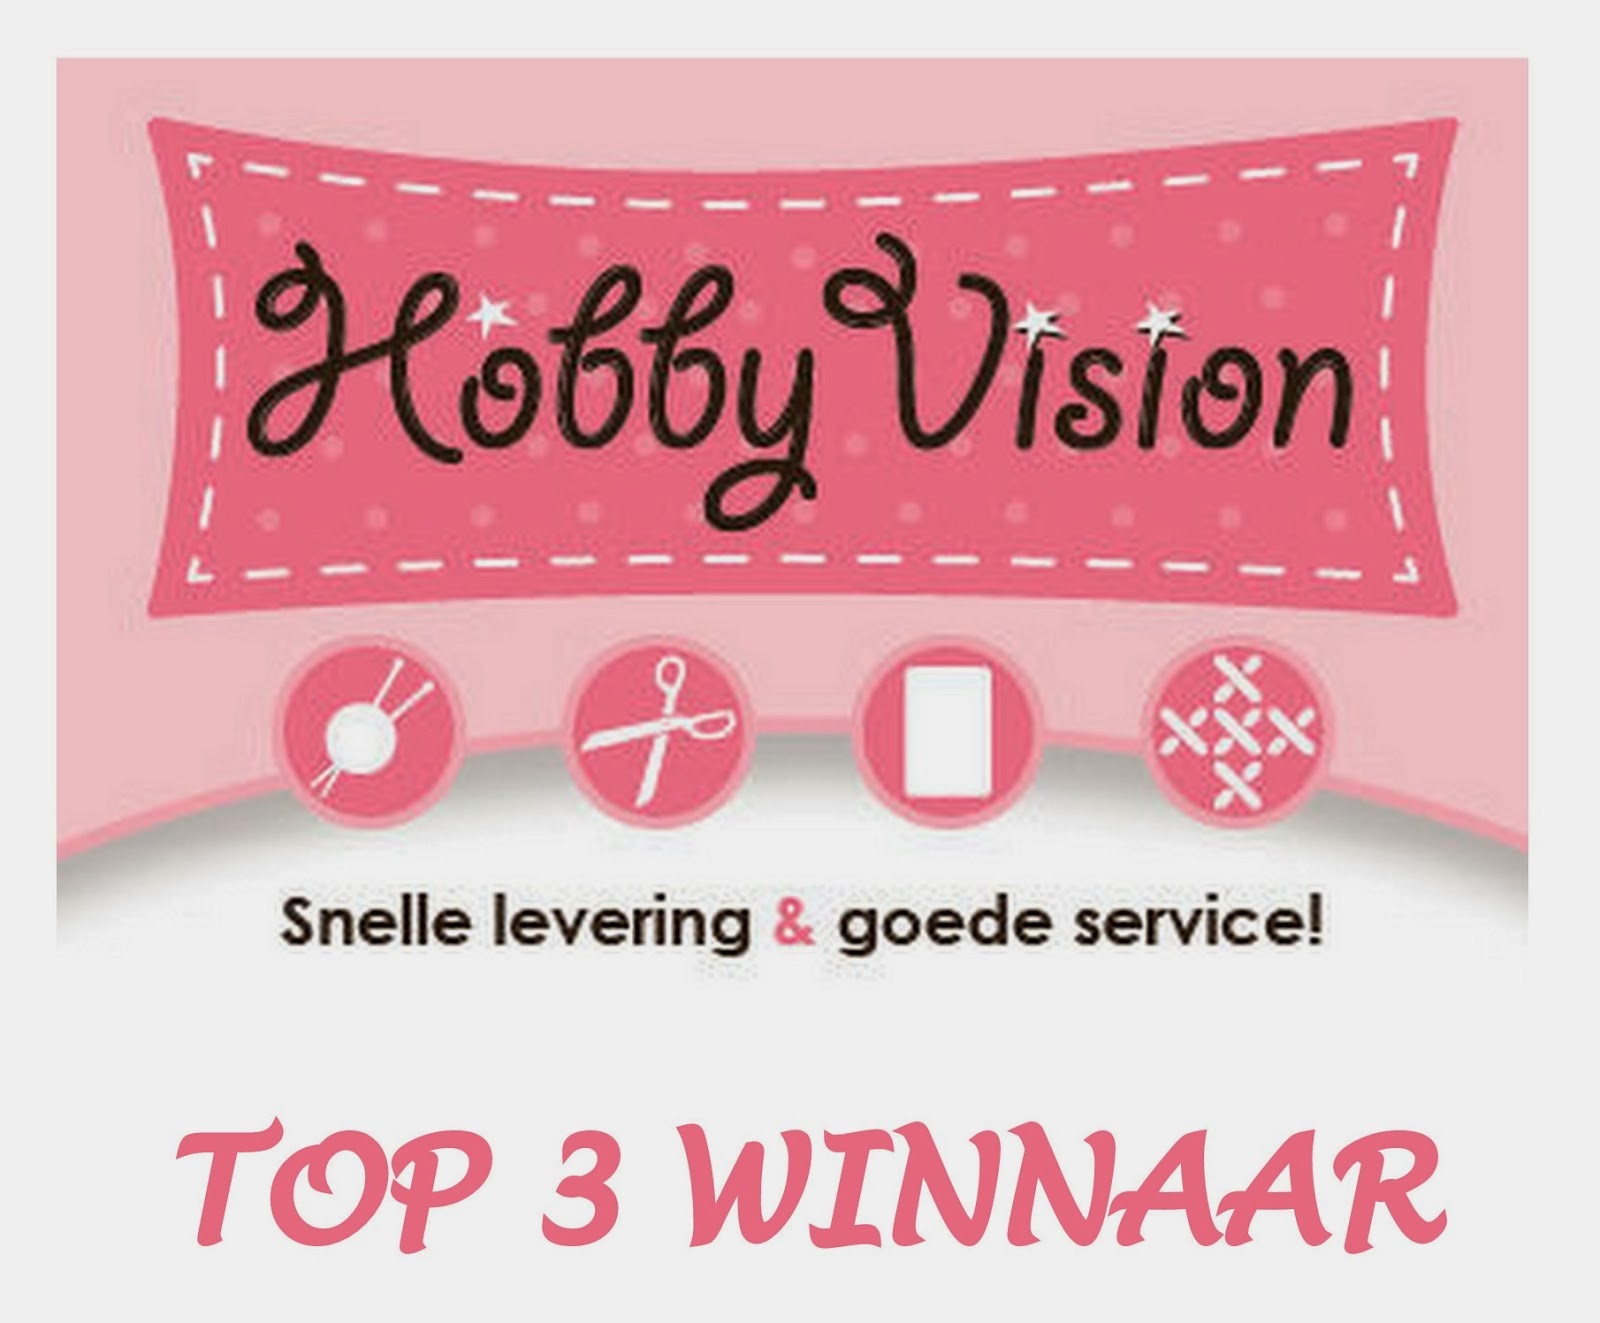 Top 3 juli 2015 Hobbyvision